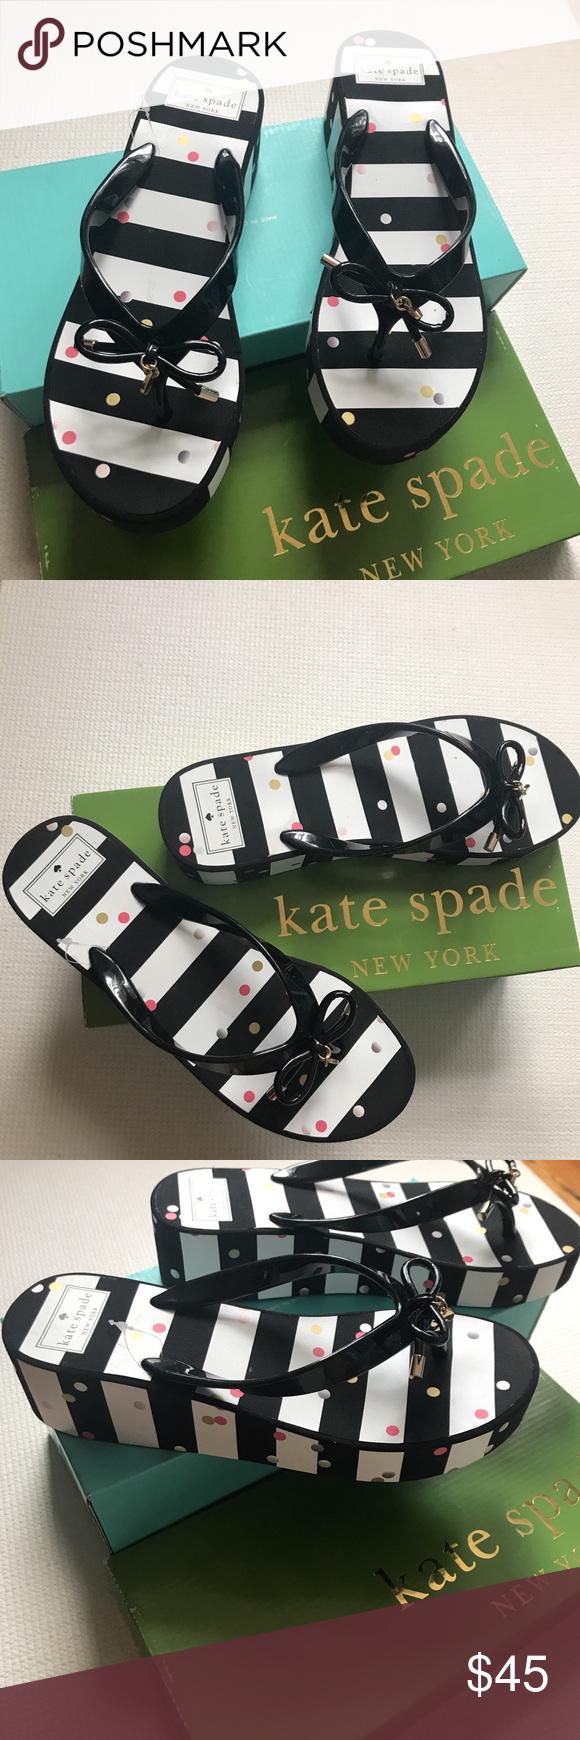 5bb19f35a1f098 🎀Kate Spade Rhett Polka Dots Flip Flops NEW Kate Spade Polka Dots Flip  Flops New Kate Spade New York authentic brand .. Polka dotted flip flops in  tonal ...